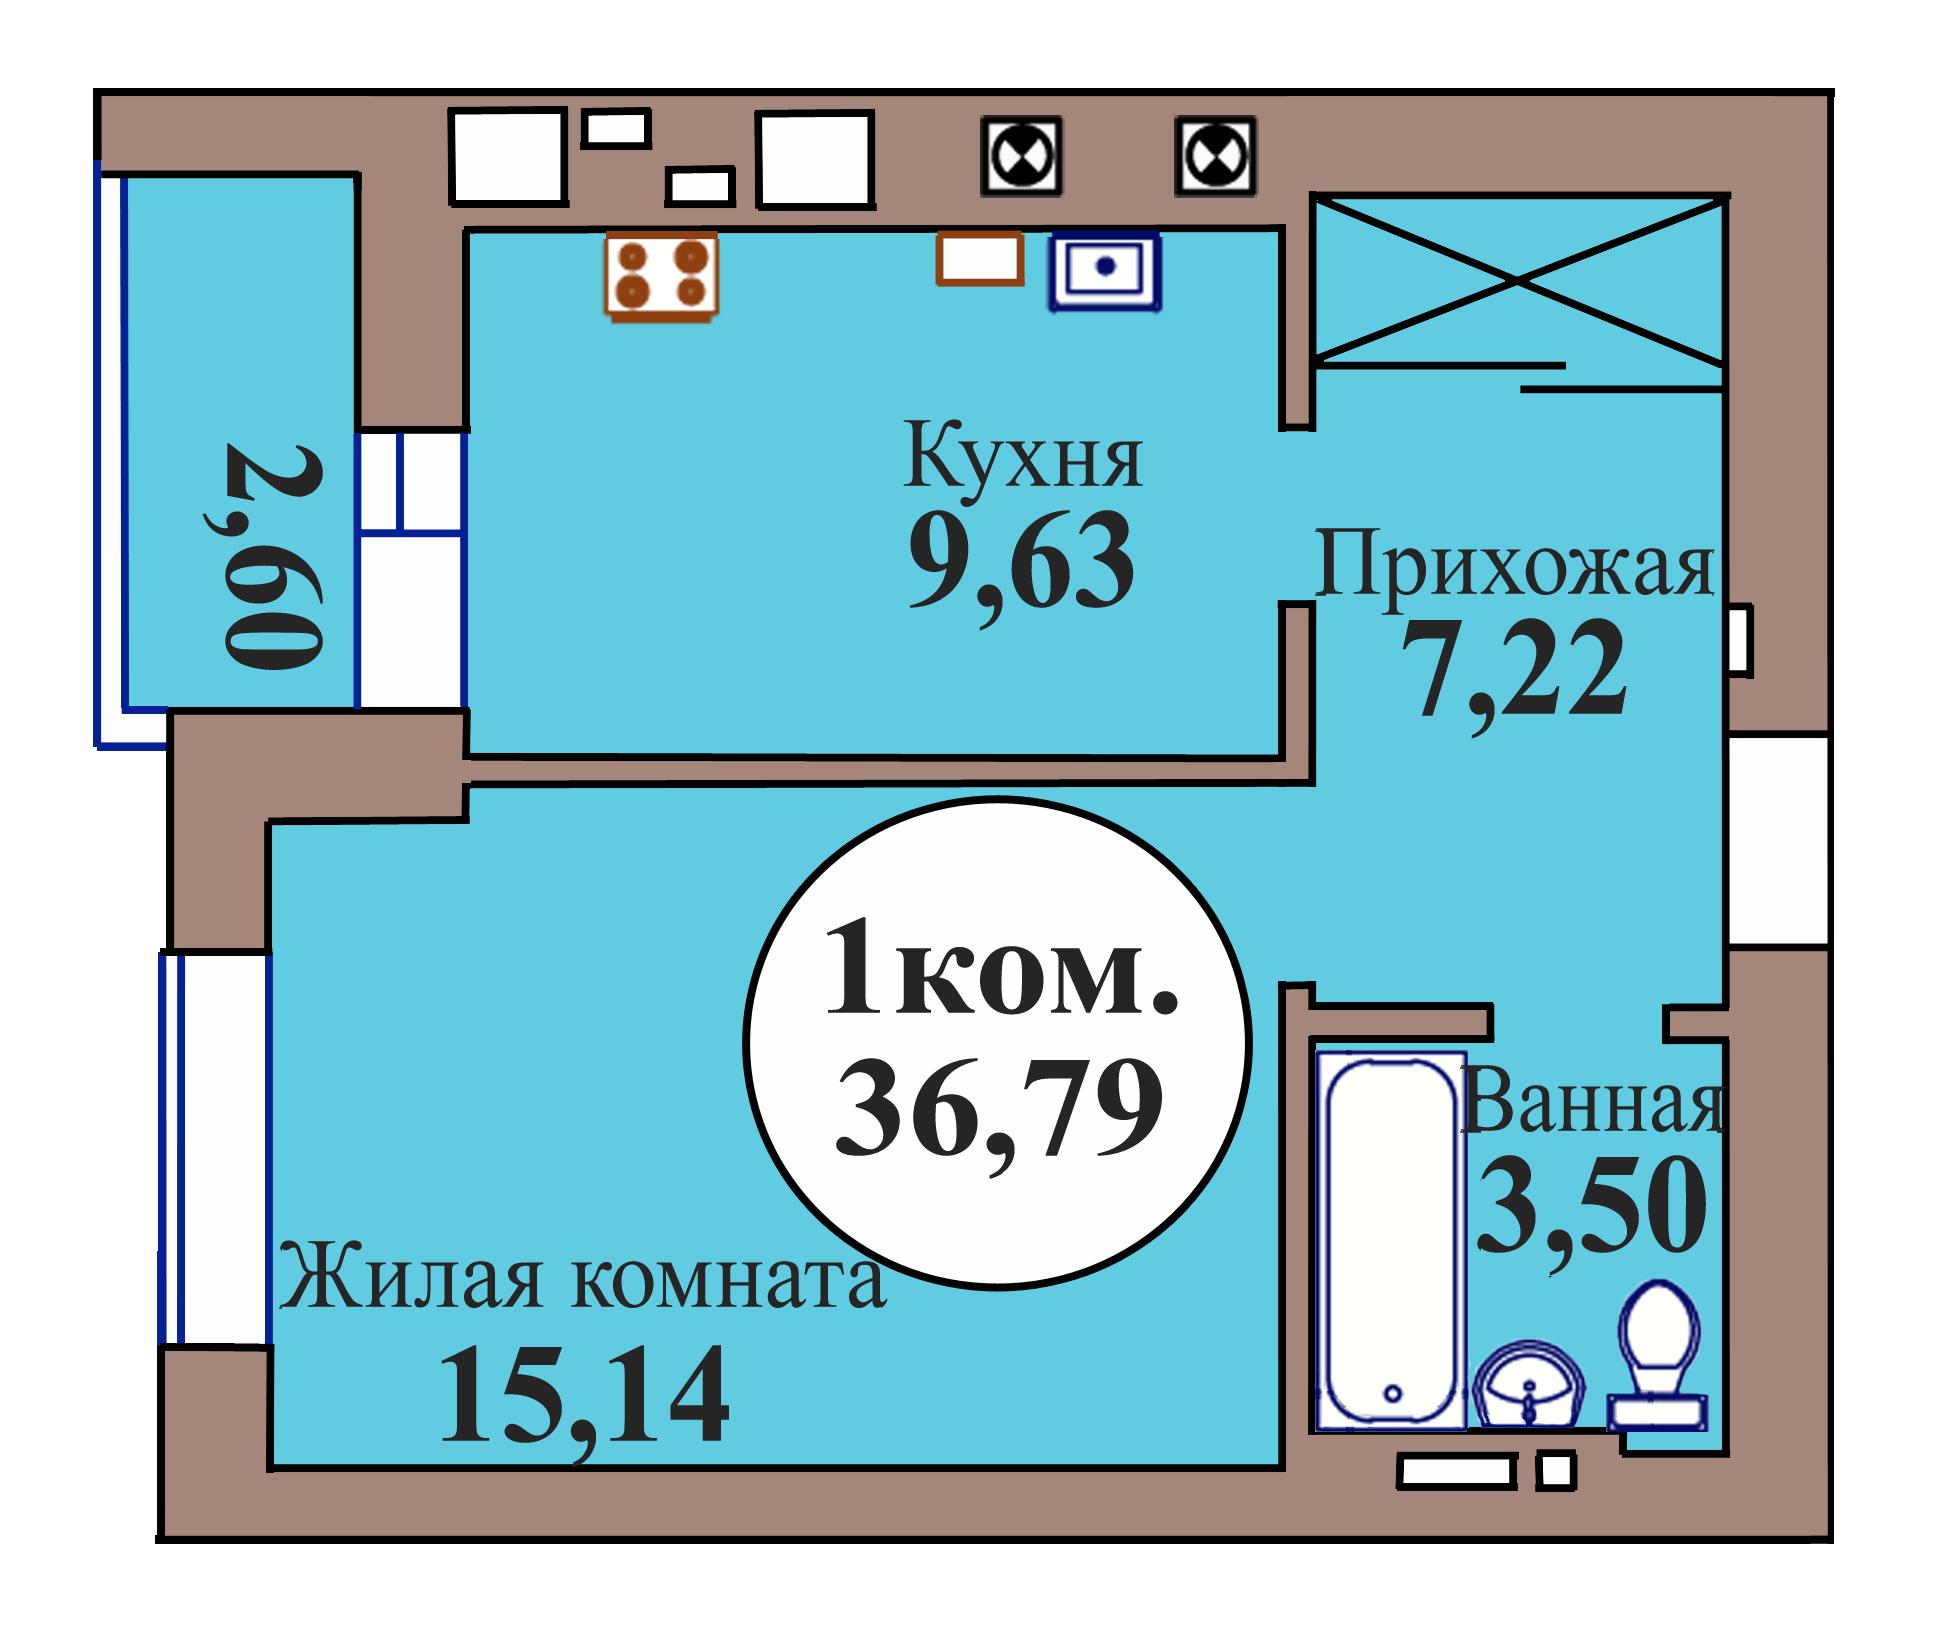 1-комн. кв. по пер. Калининградский, 5 кв. 76 в Калининграде